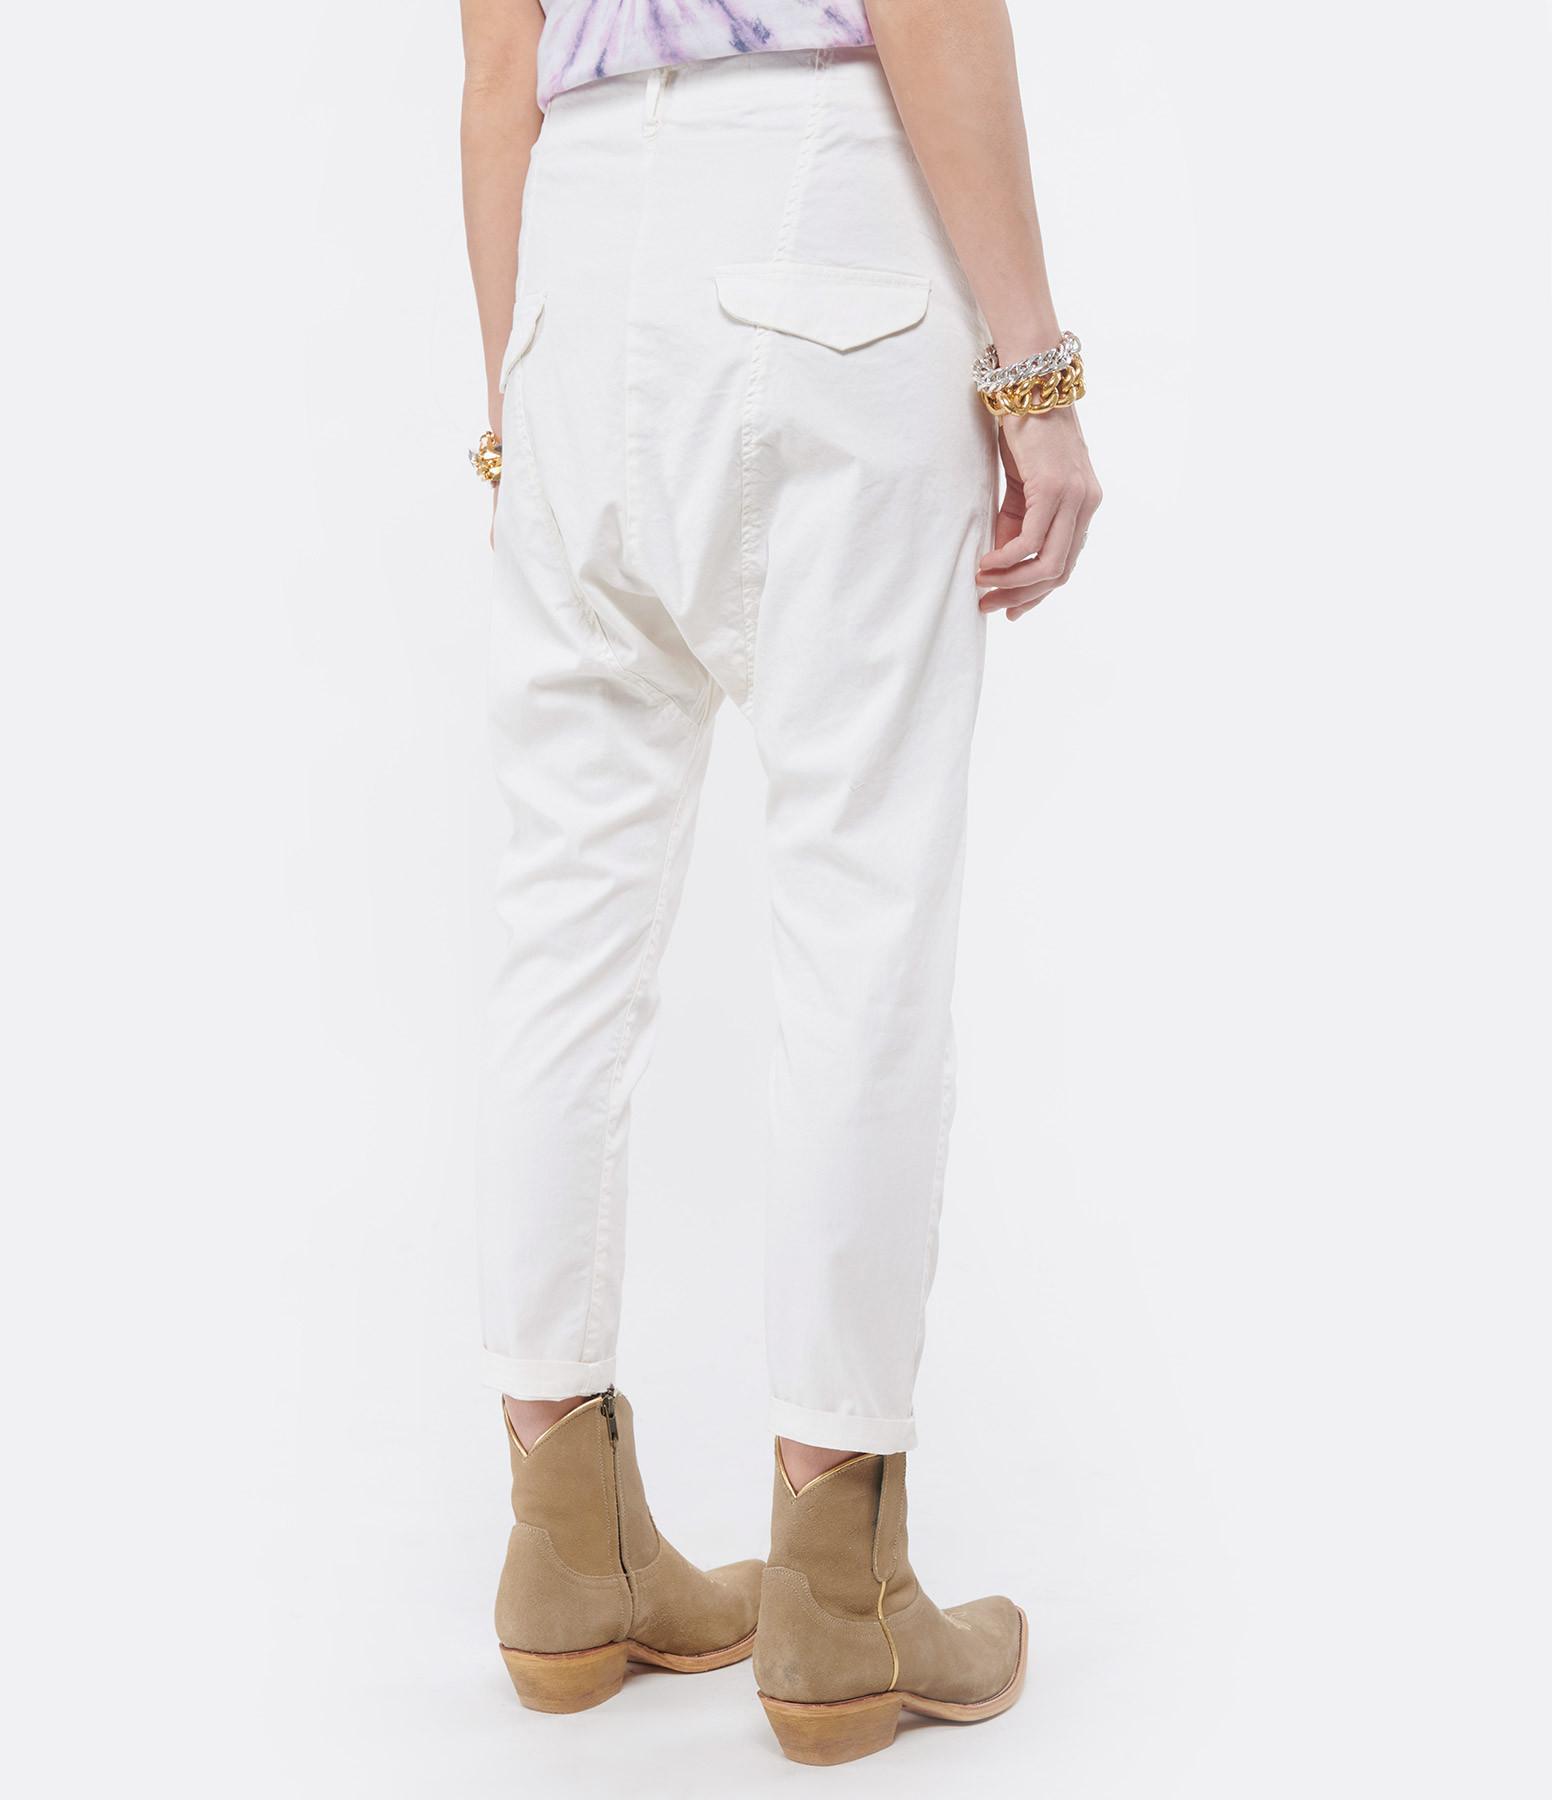 NILI LOTAN - Pantalon Paris Beige